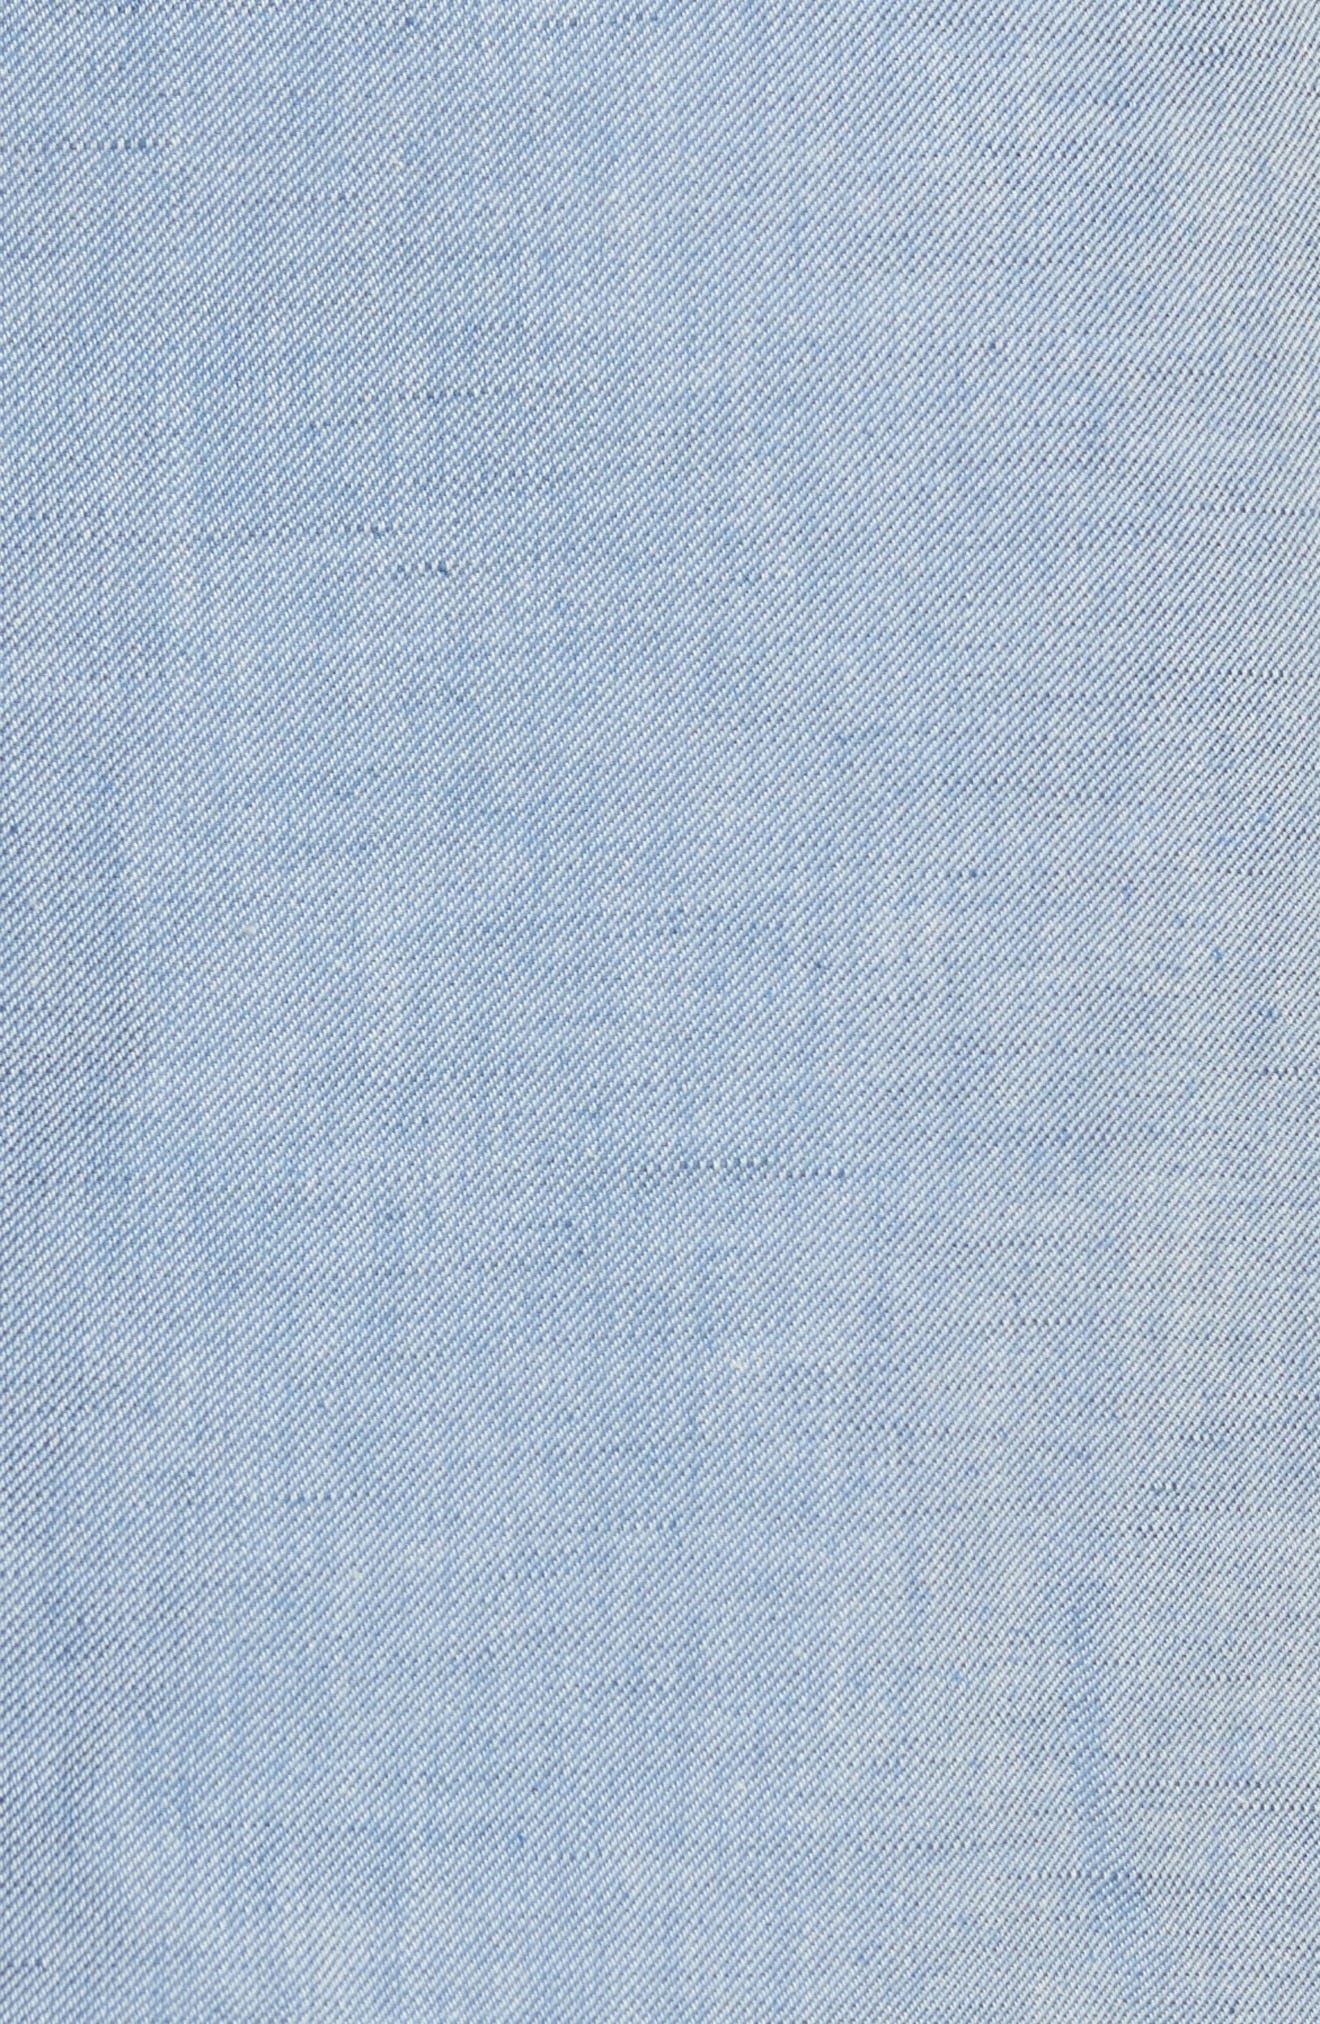 Jupe Genou Skirt,                             Alternate thumbnail 5, color,                             400